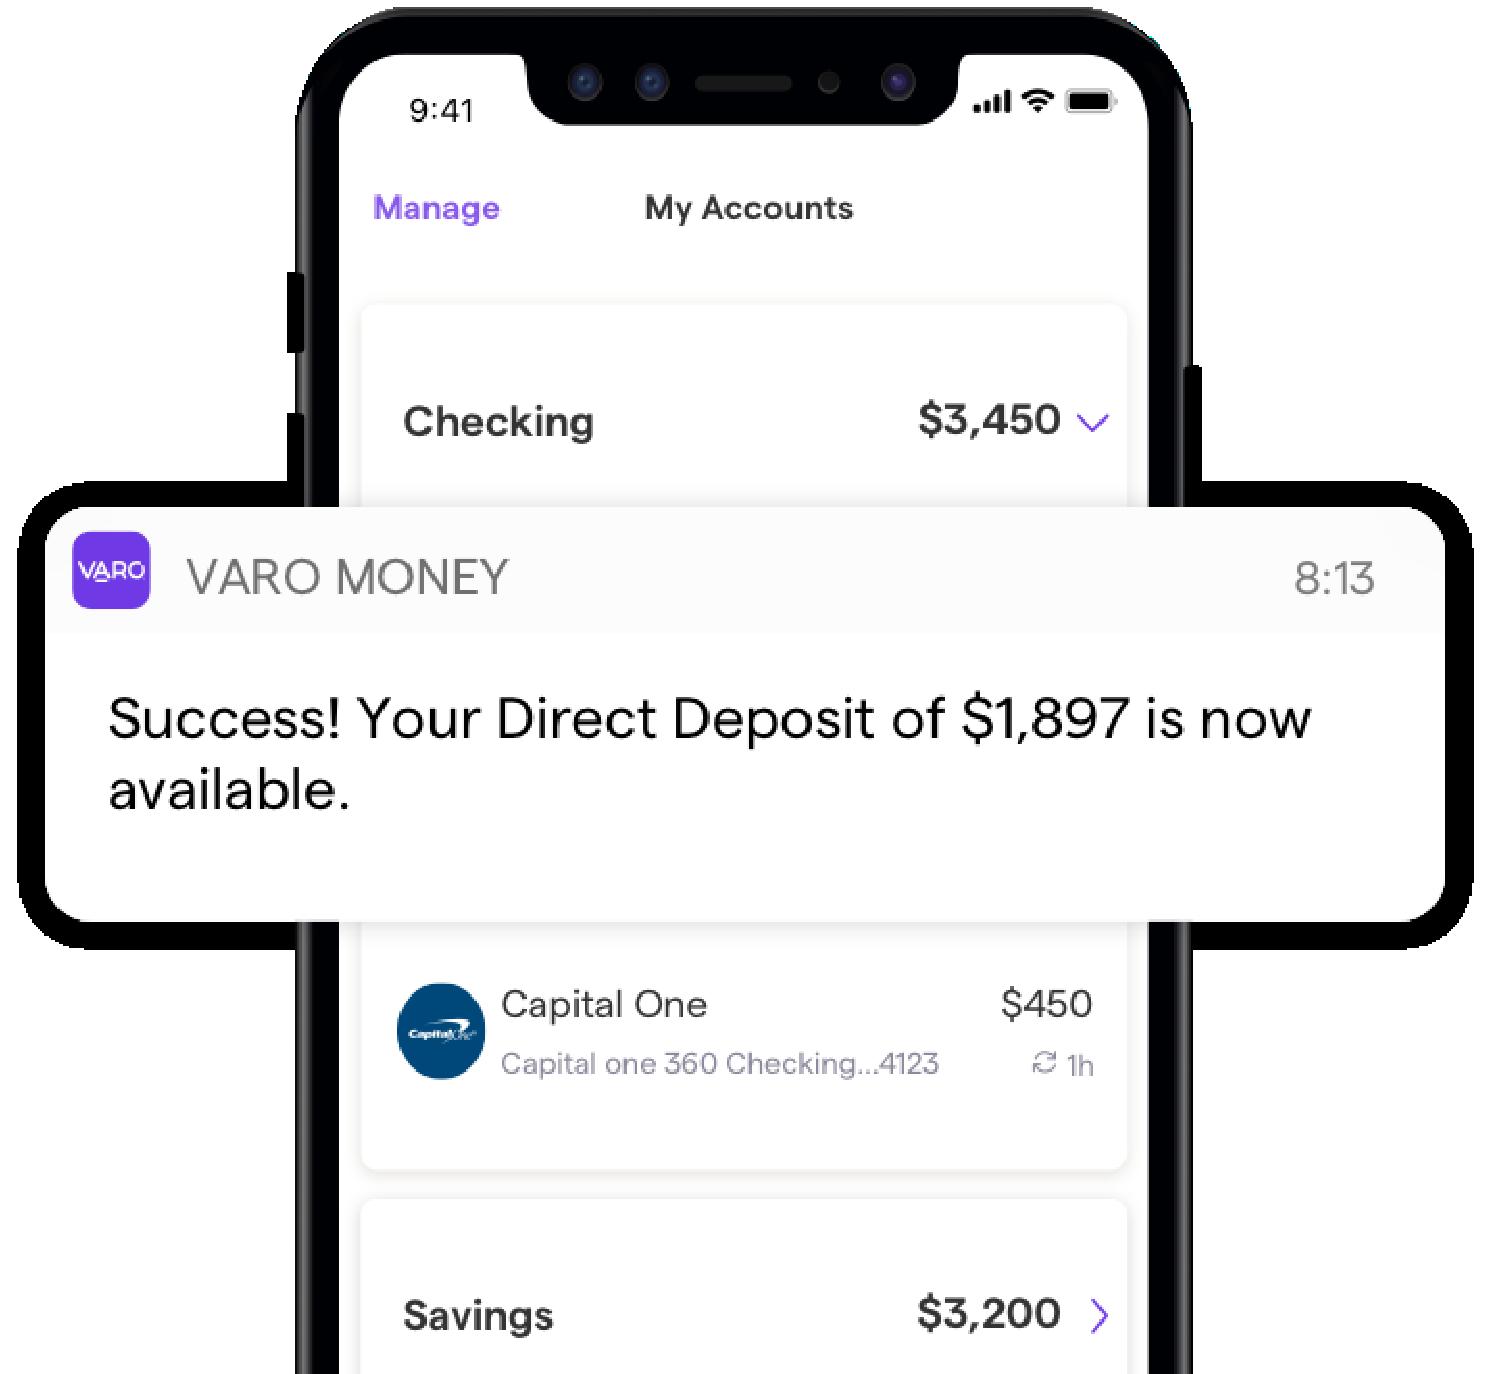 Referral April 2019 Varo Money Visa Debit Card Banking App High Yield Savings